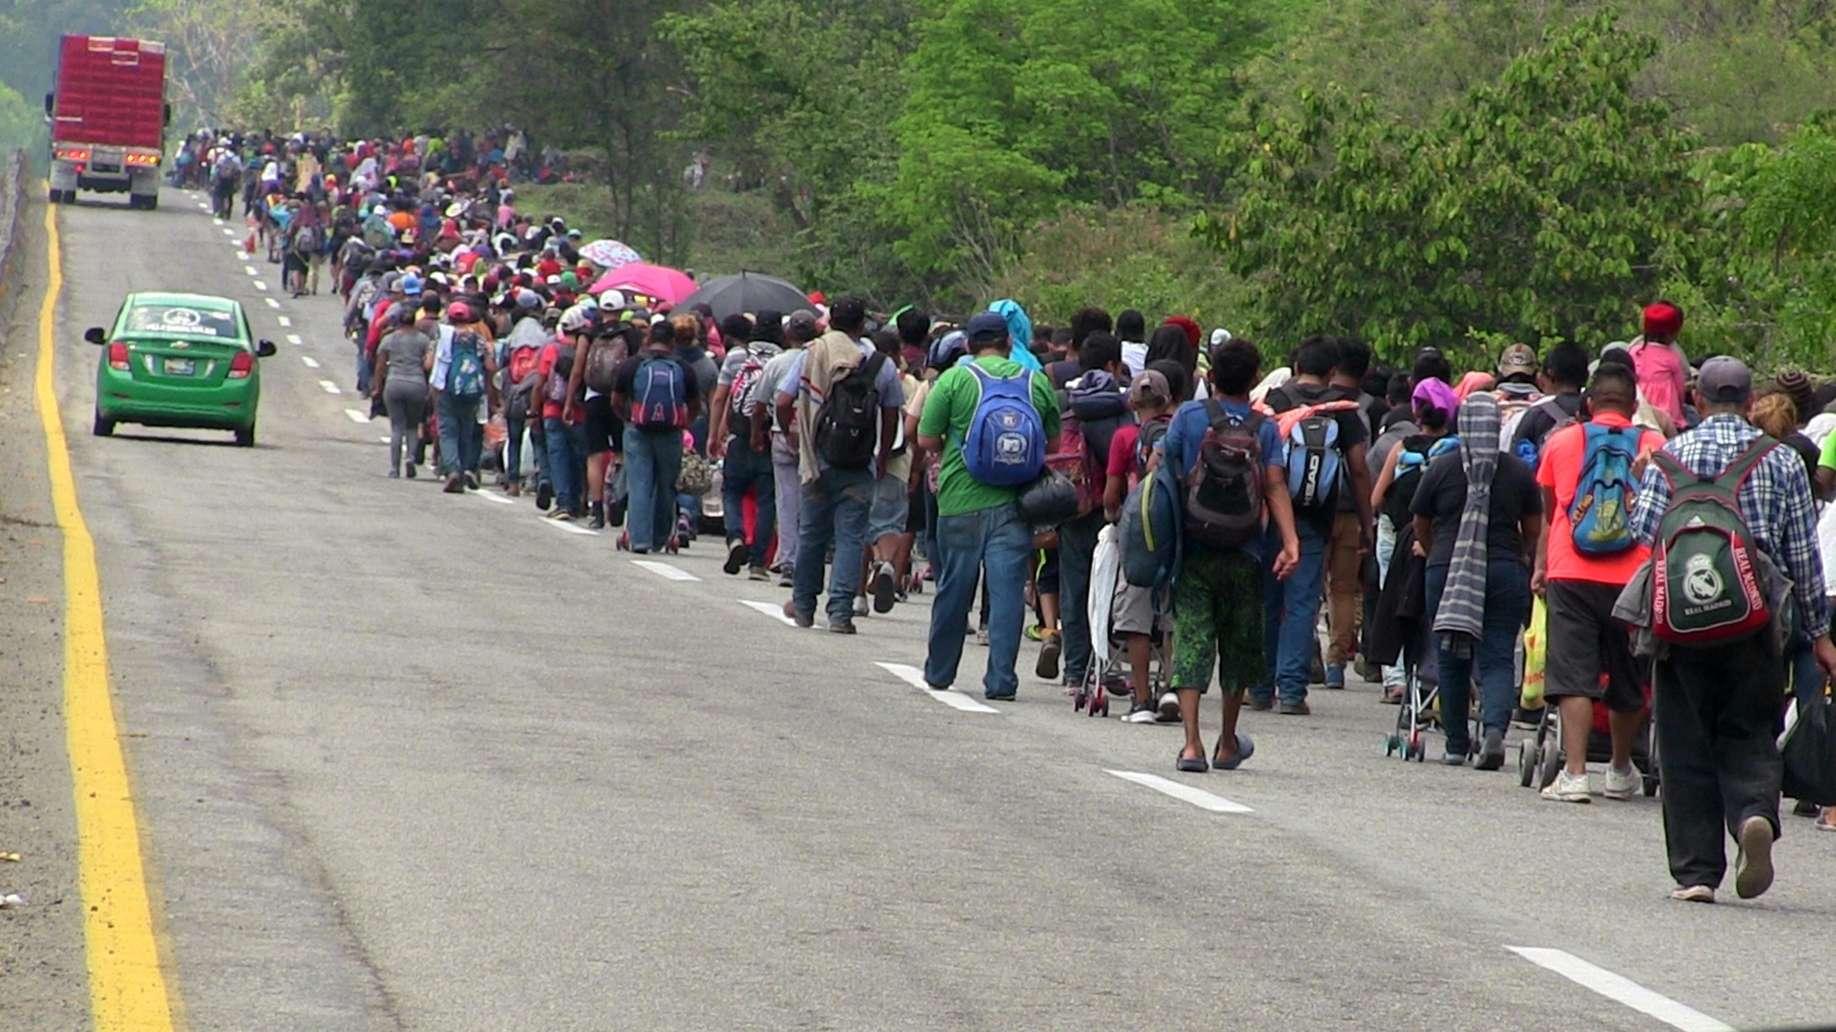 25.03.2019, Mexiko, Huehuetán: Migranten auf der Flucht aus der Heimat Richtung USA.